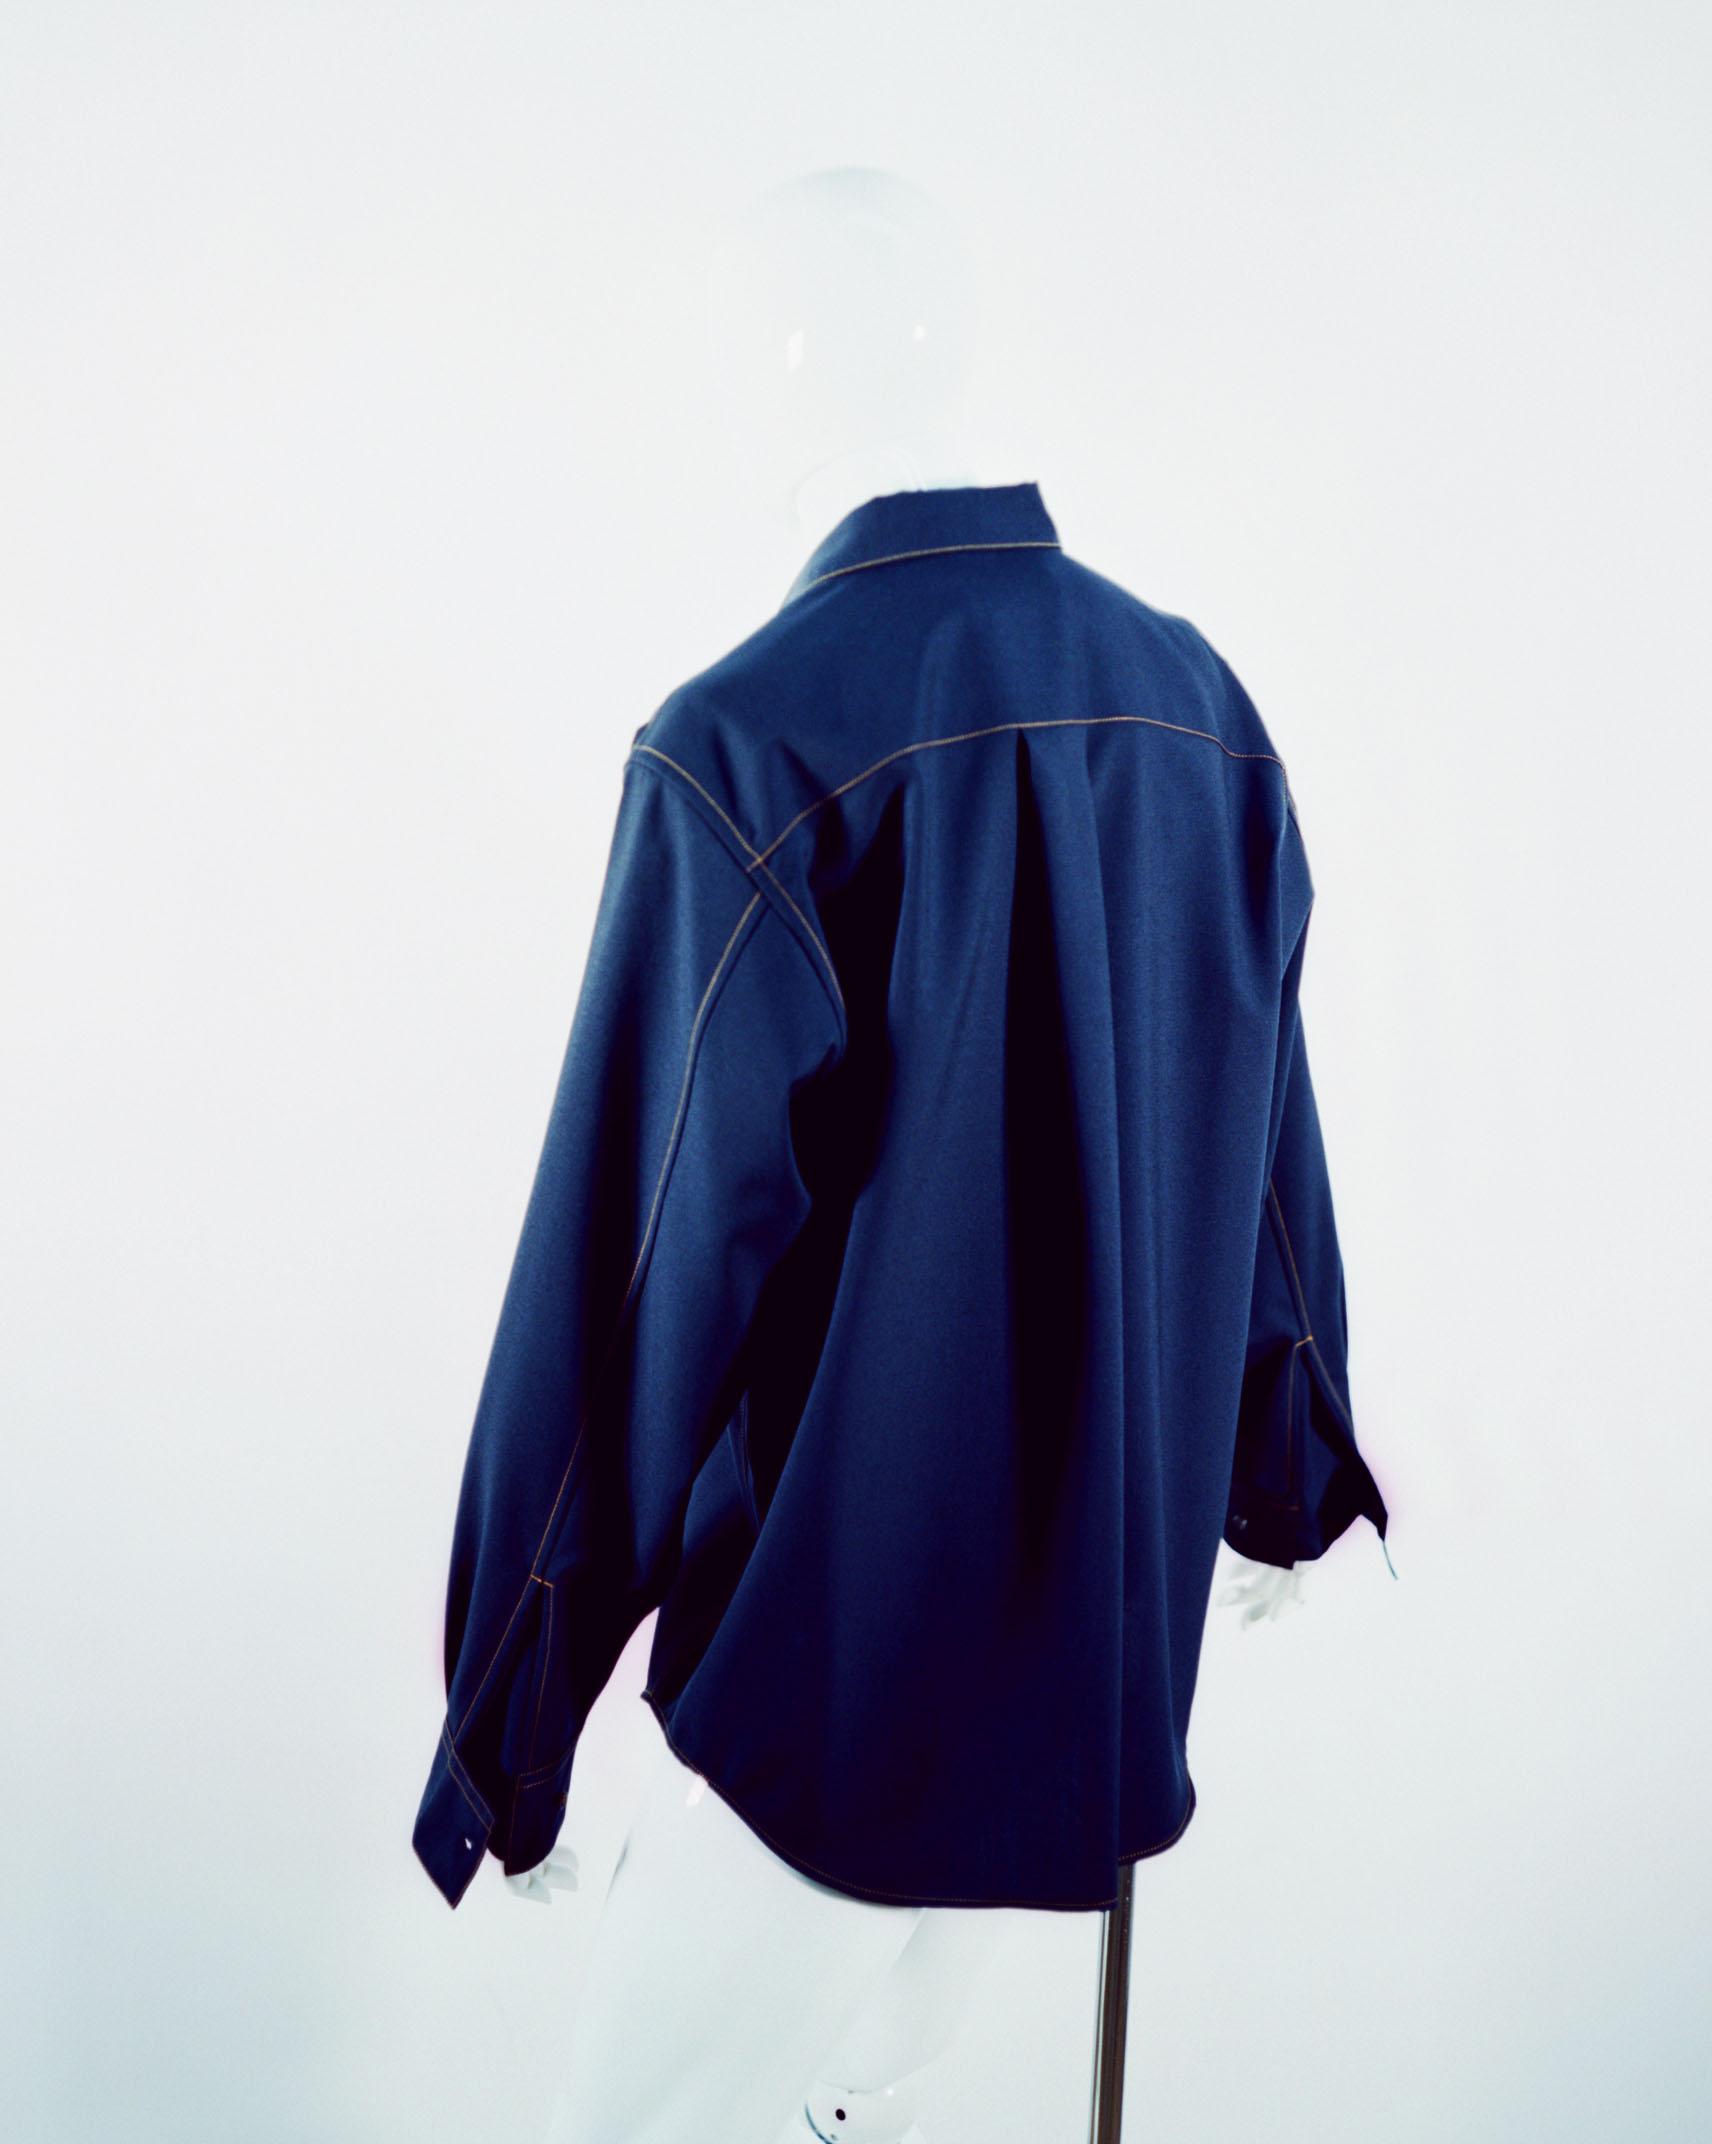 MARNI TROPICAL WOOL SHIRT BLUE NAVY